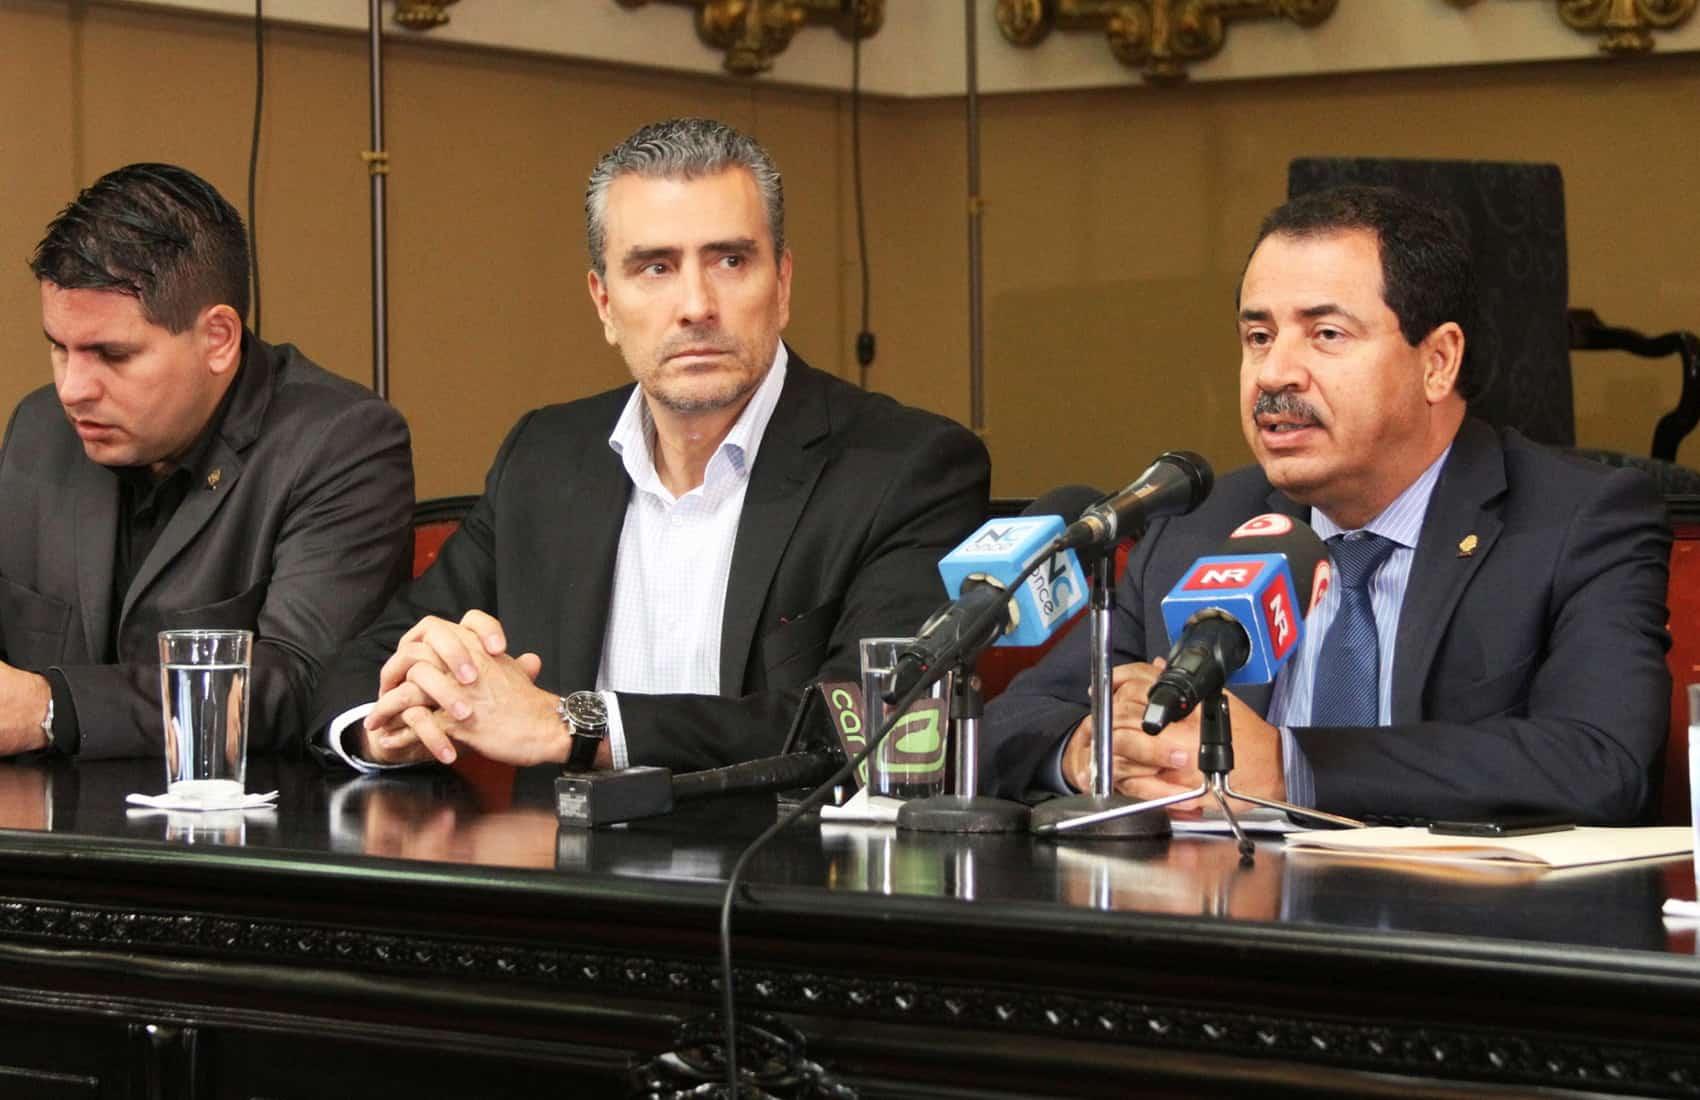 Lawmakers press conference. Dec. 19, 2014.